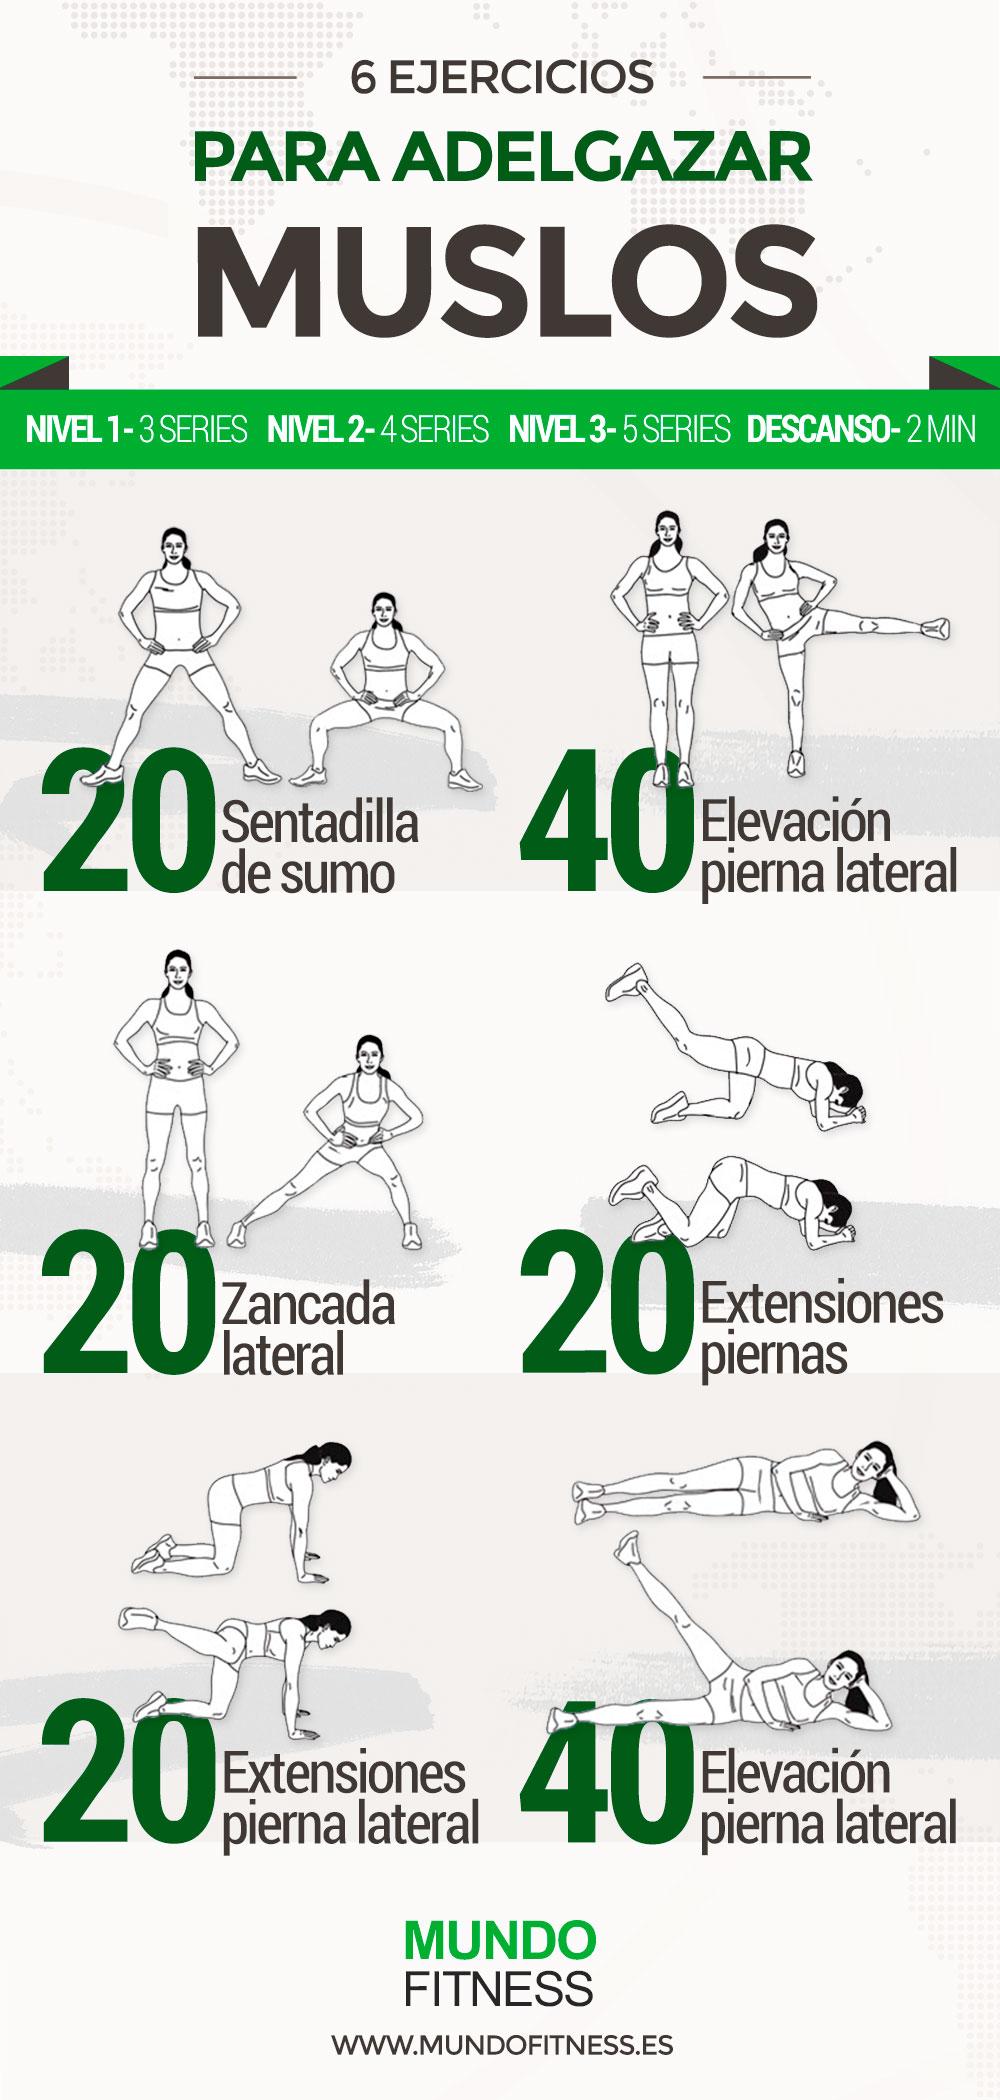 adelgazar-muslos-piernas-ejercicios-infografia